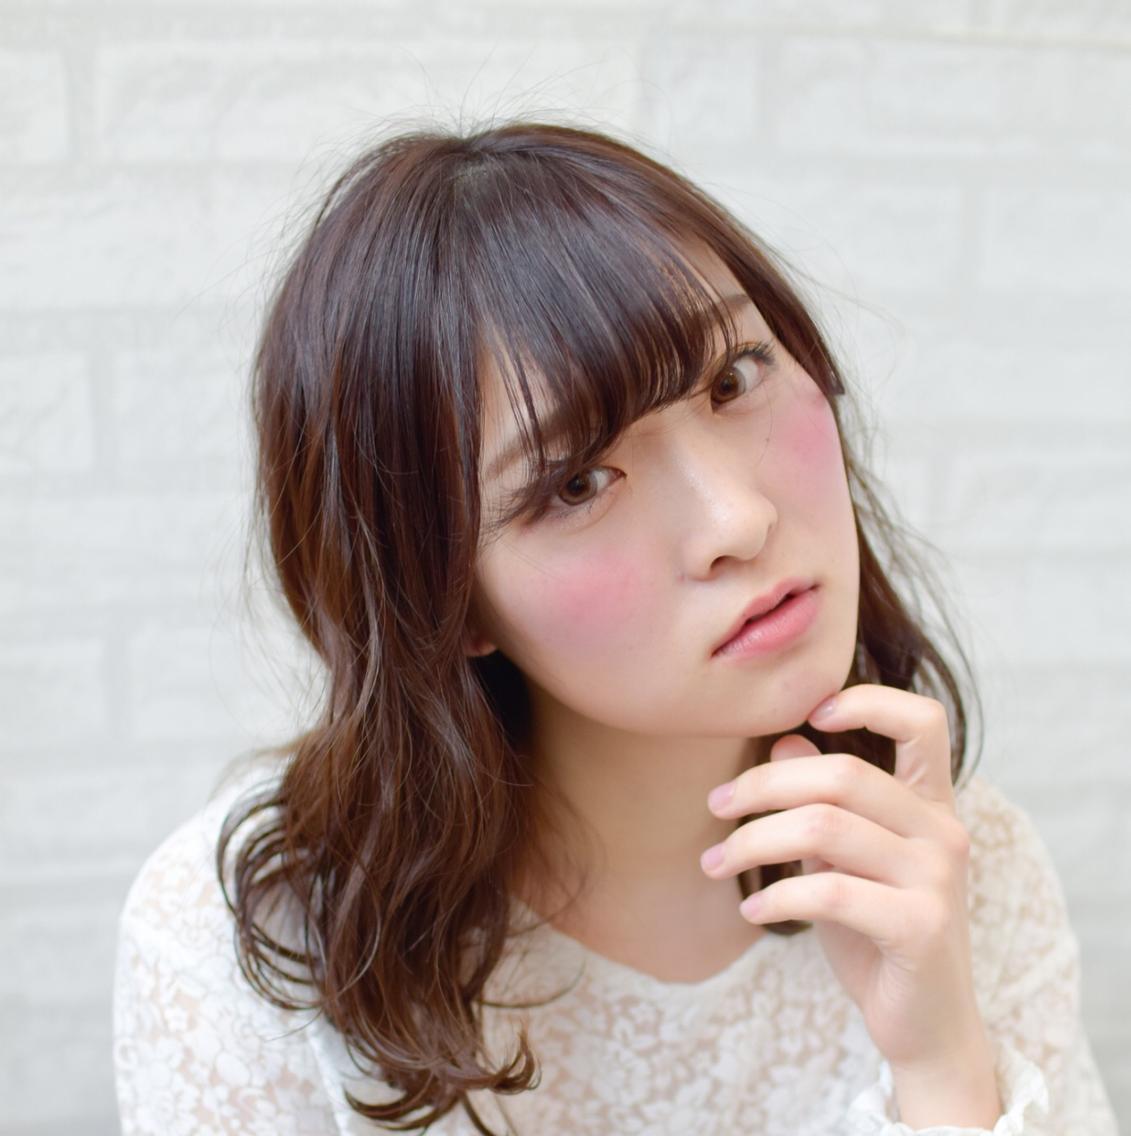 zina東京所属・佐藤 敬人の掲載